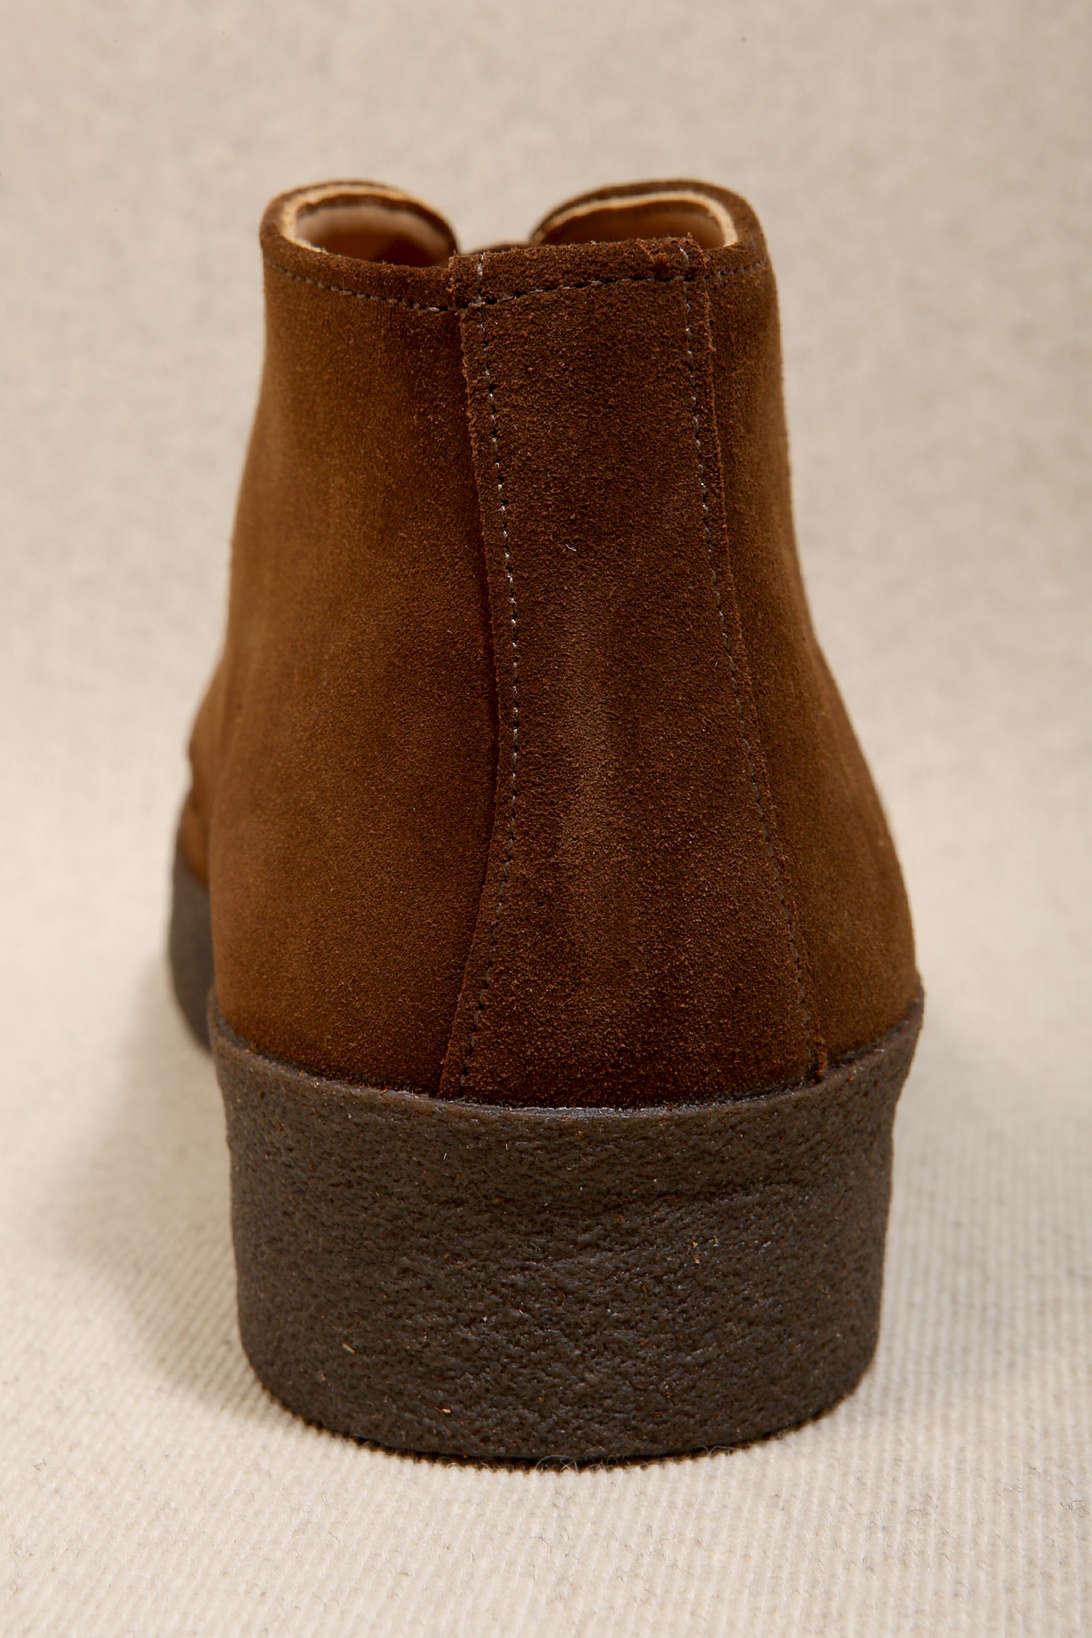 Sanders-playboy-boots-chaussures-Steve-mcqueen-2-lecatalog.com